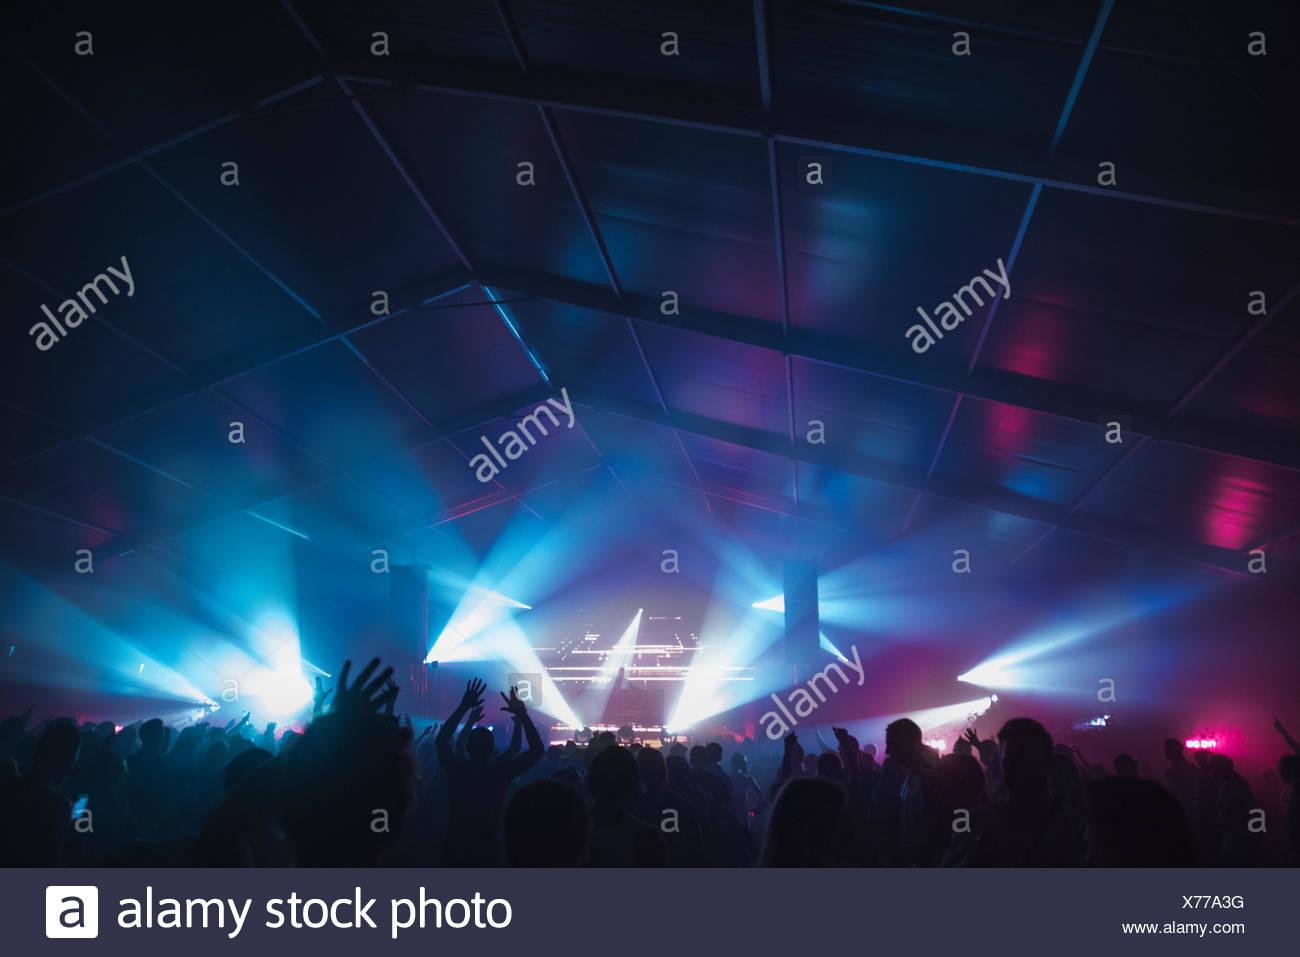 Finland, Uusimaa, Helsinki, Cheering audience at Summer Sound Festival - Stock Image